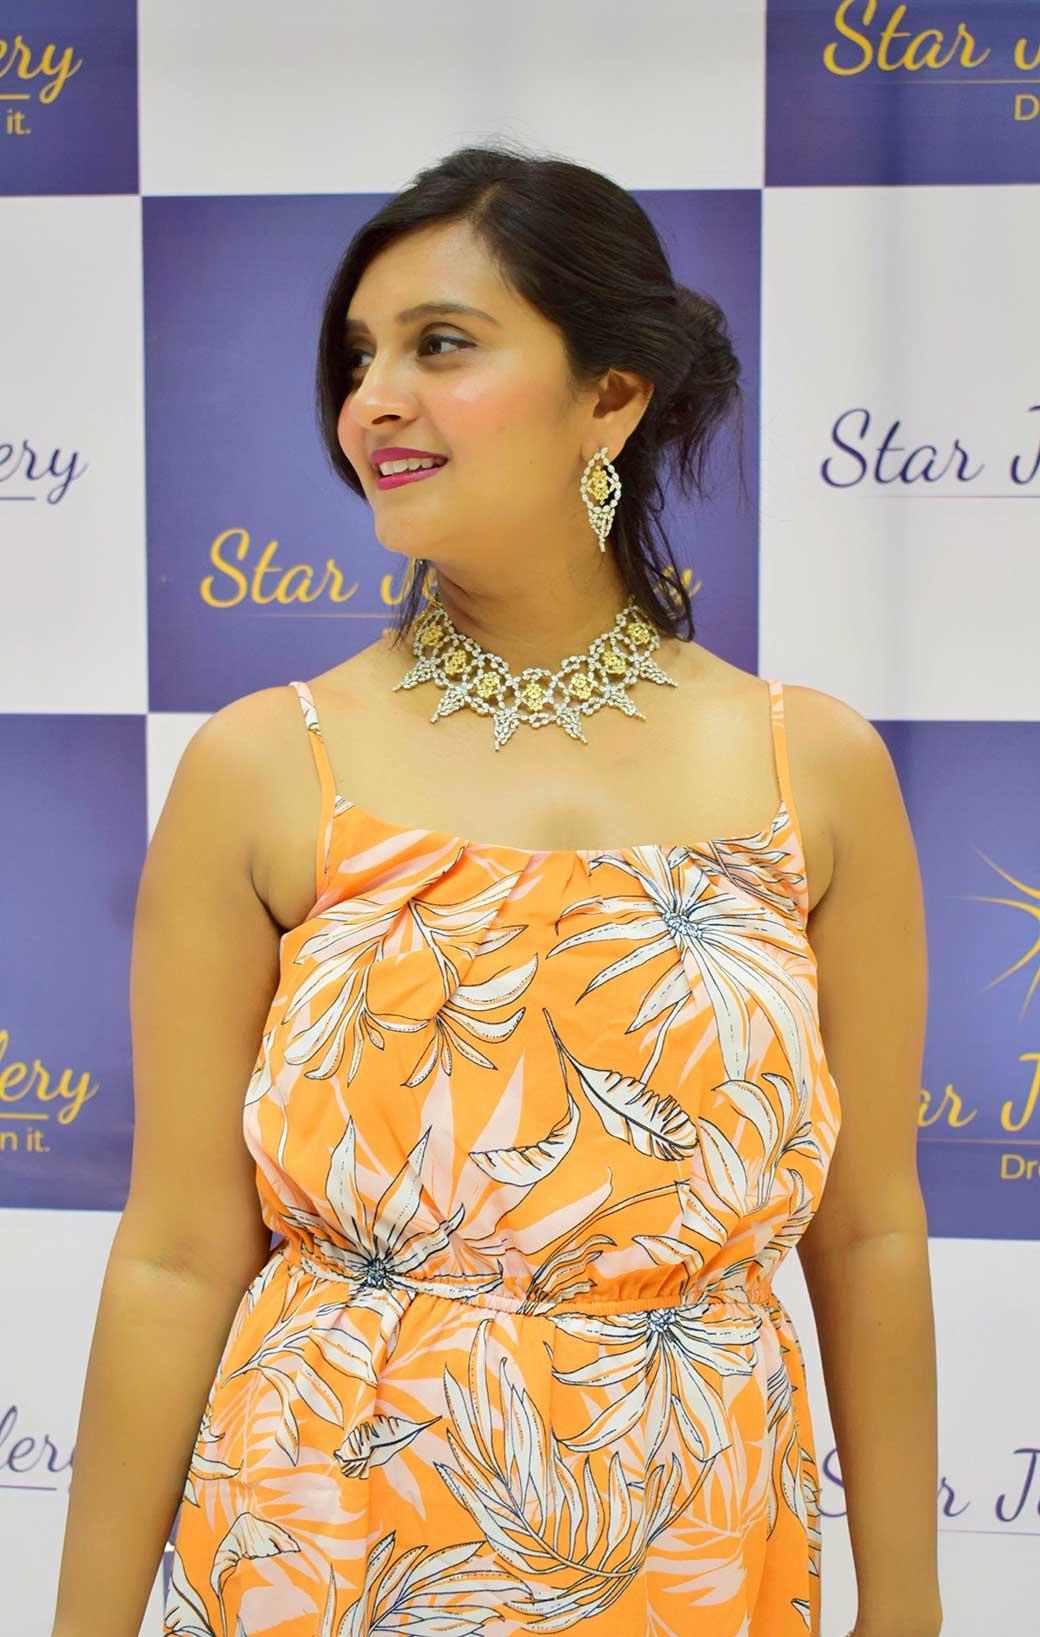 Star Jewellery 4 - Star Jewellery 4